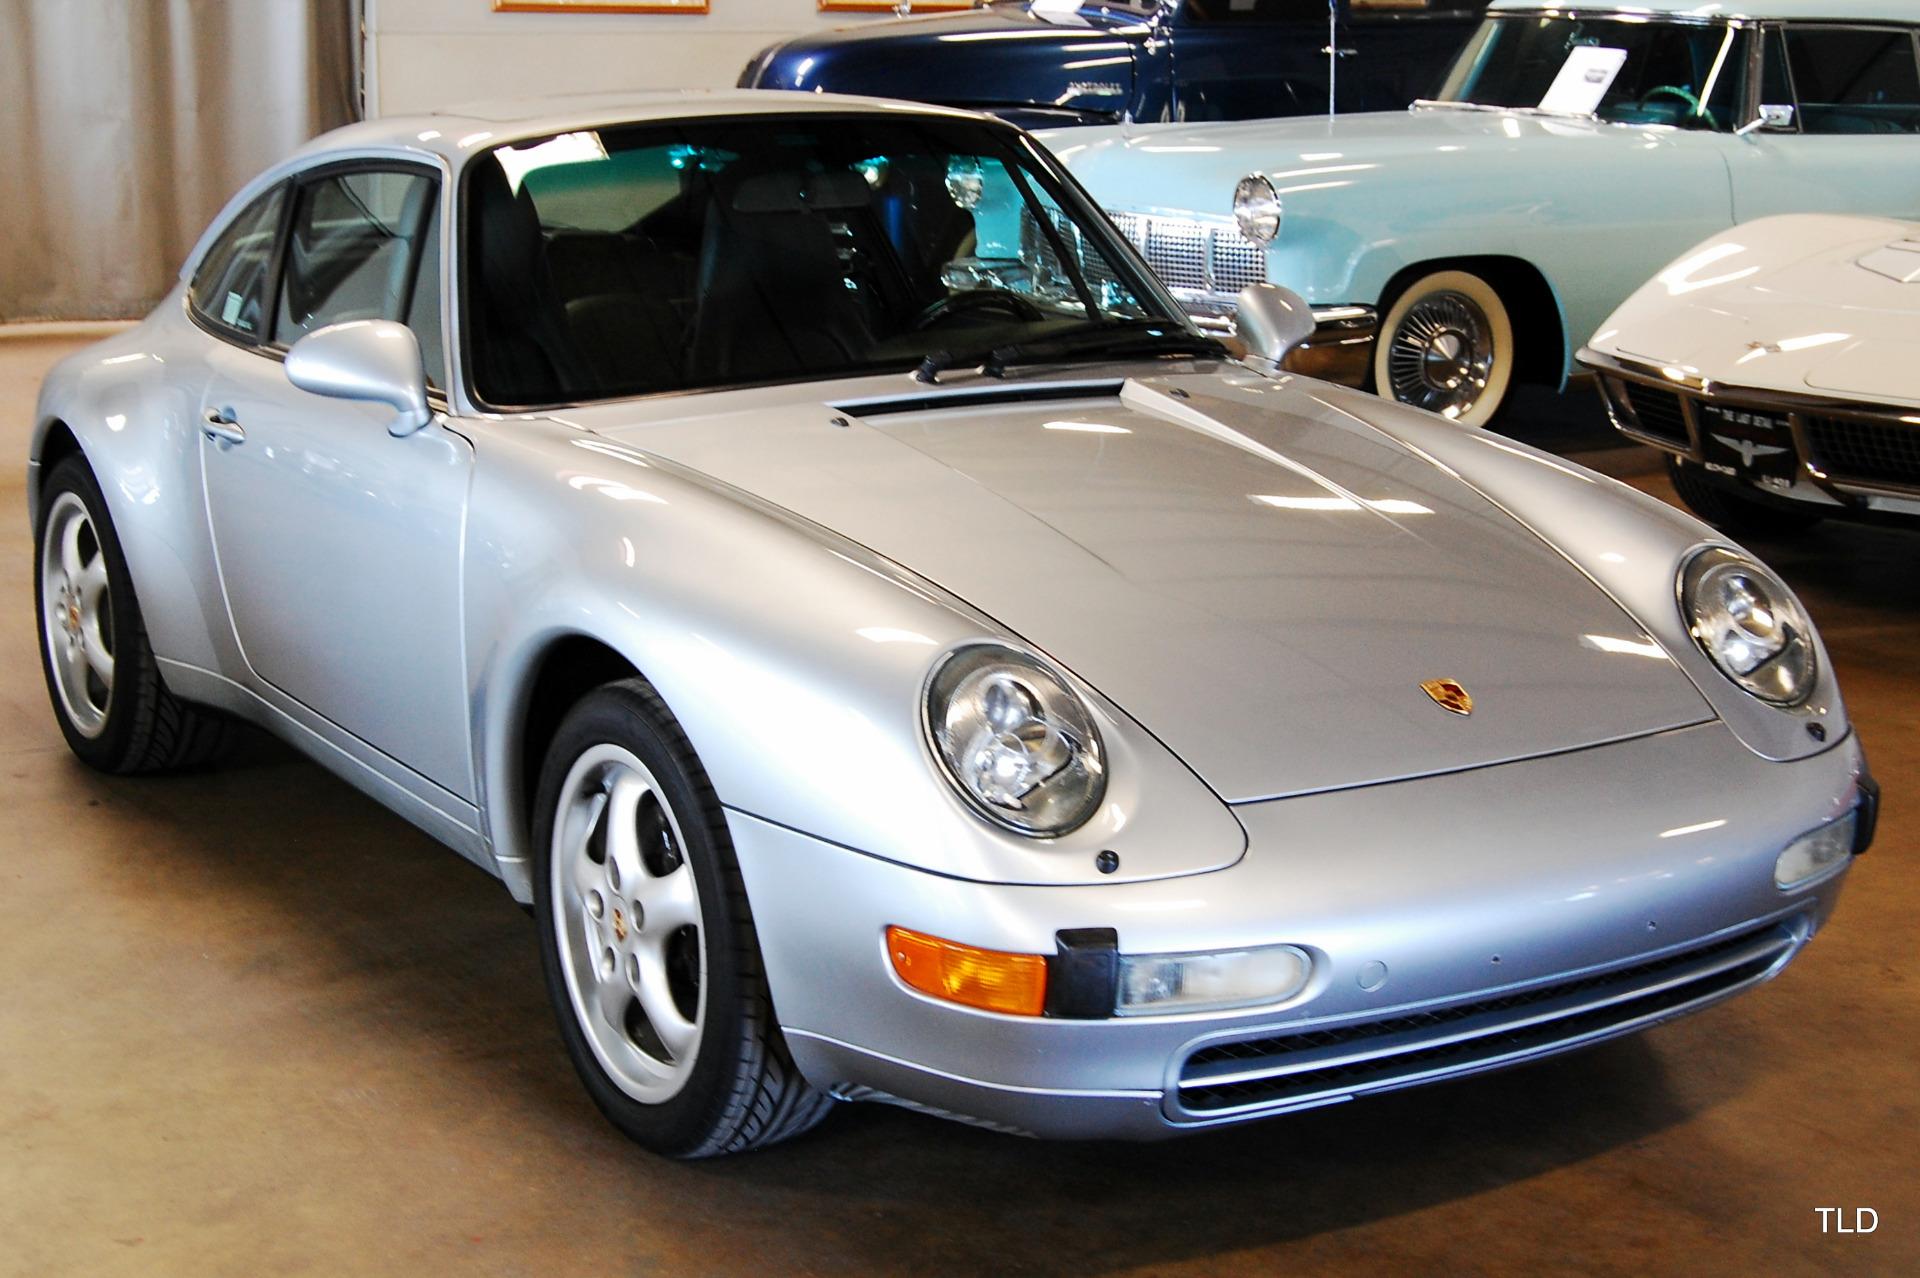 1995 Porsche 911 Used Porsche 911 For Sale In North